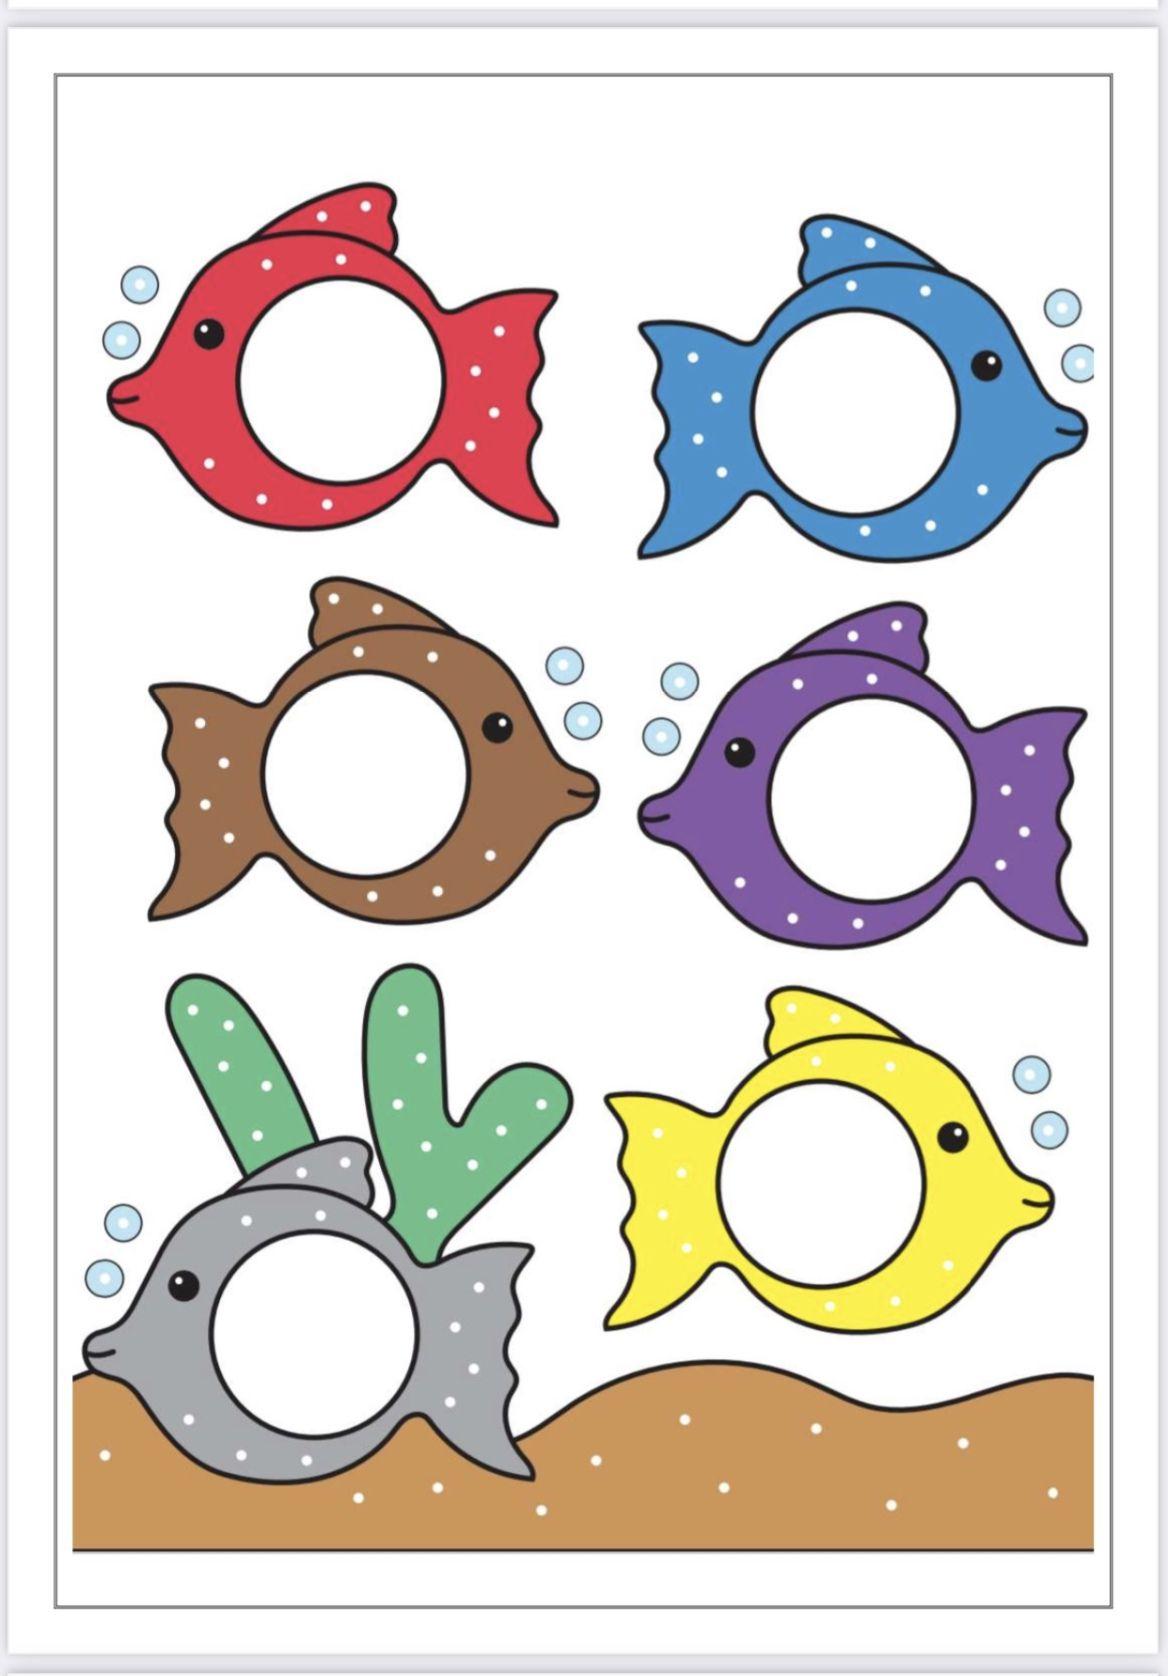 طابق الوان السمك In 2021 Preschool Activities Preschool Learning Activities Early Childhood Education Activities